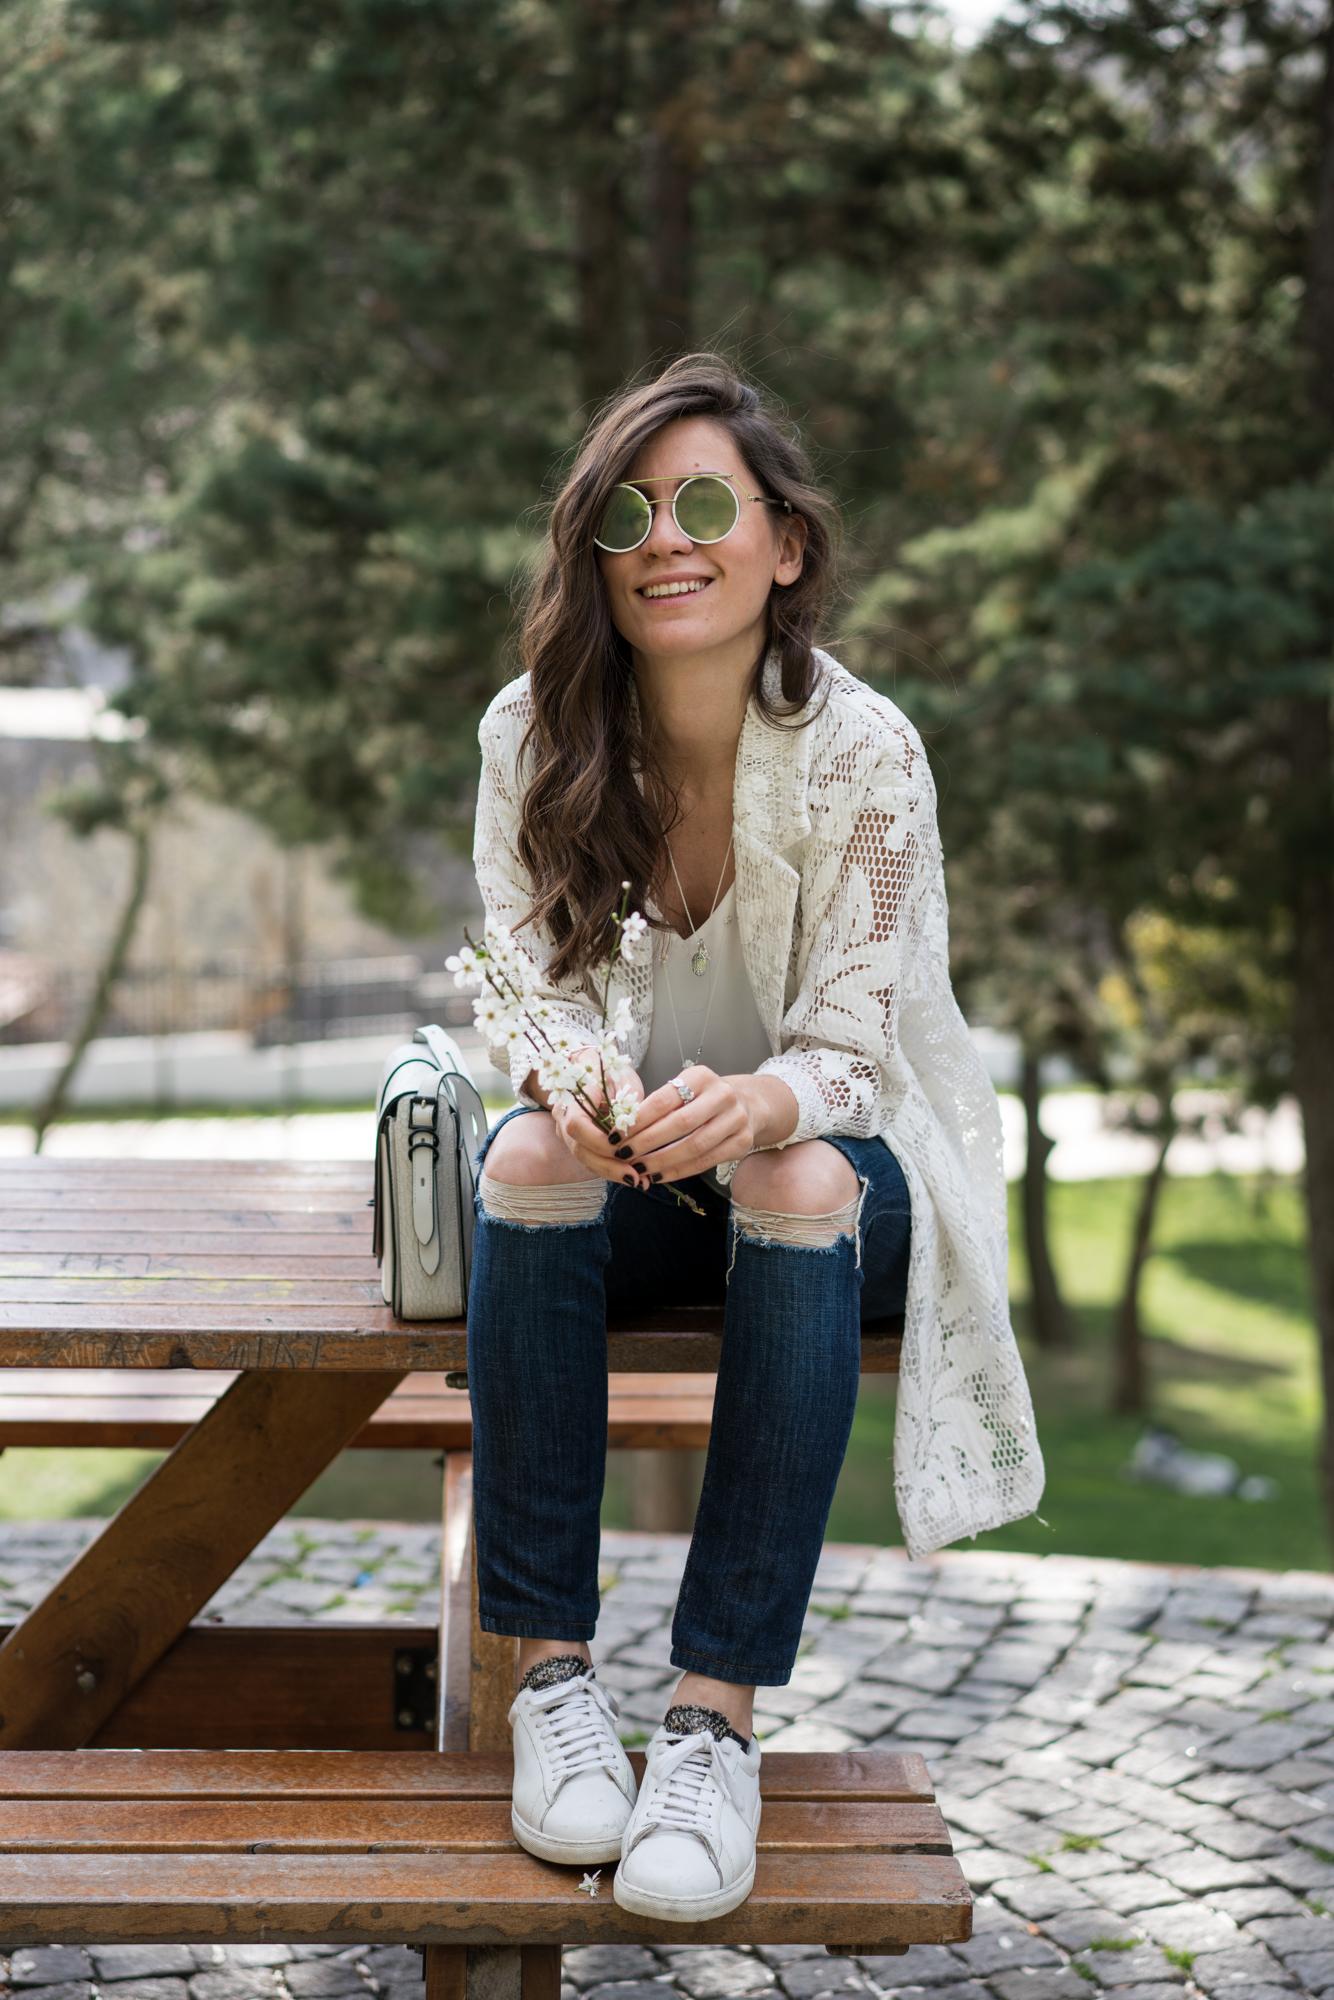 billur saatci, offnegiysem, street style, turkish style blogger, pandora, pandora bahar koleksiyonu, jewellery, jewelery